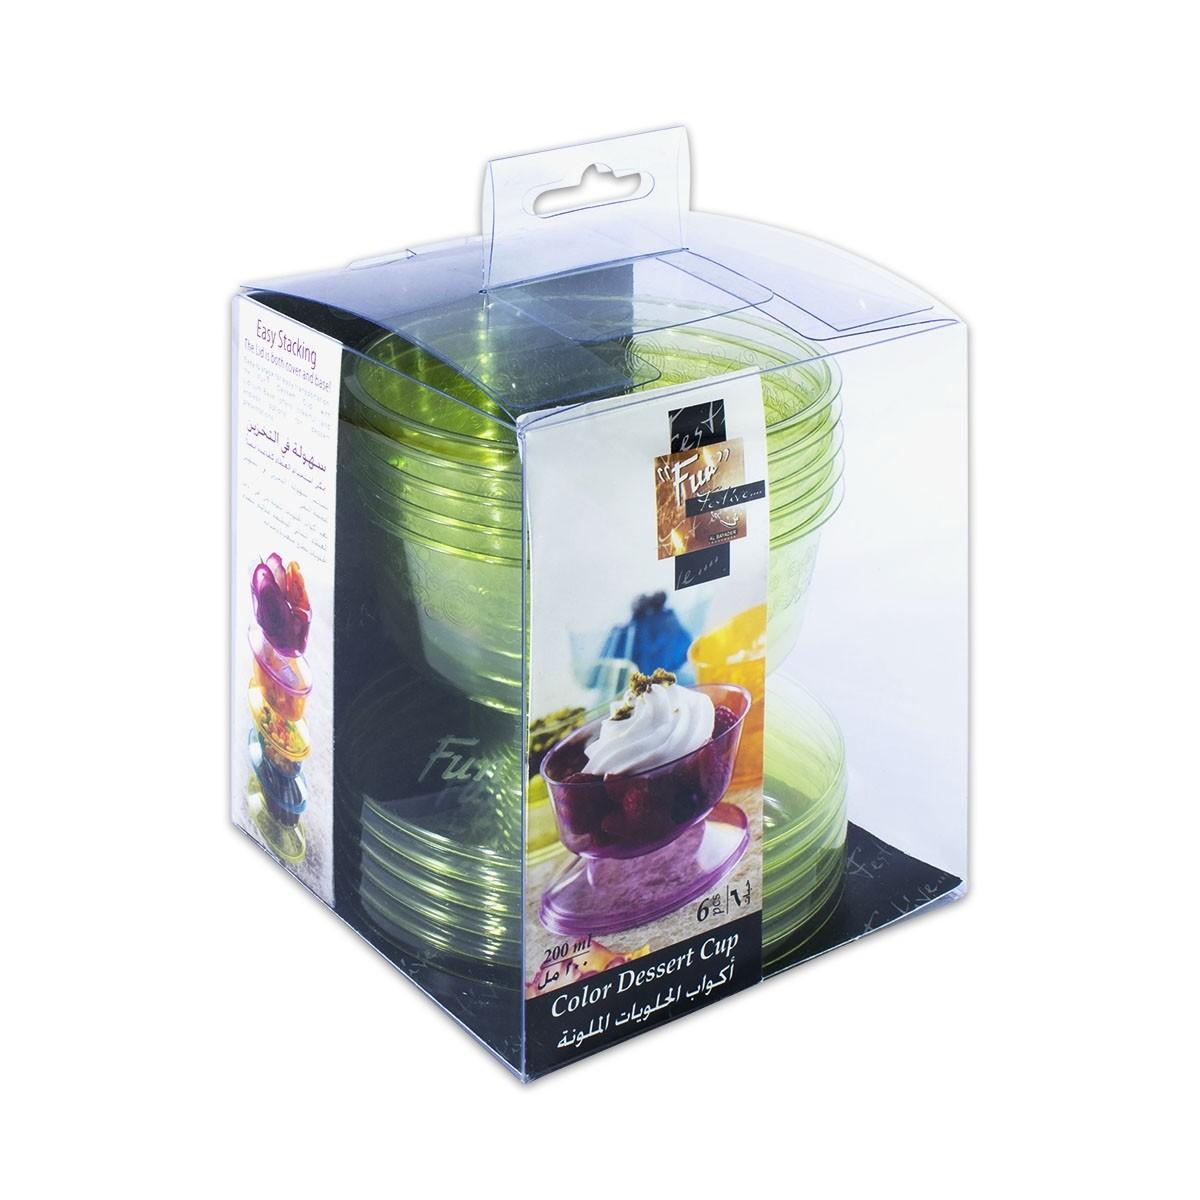 Fun® Coloured Dessert Cup - Olive | 6pcsx24pkts